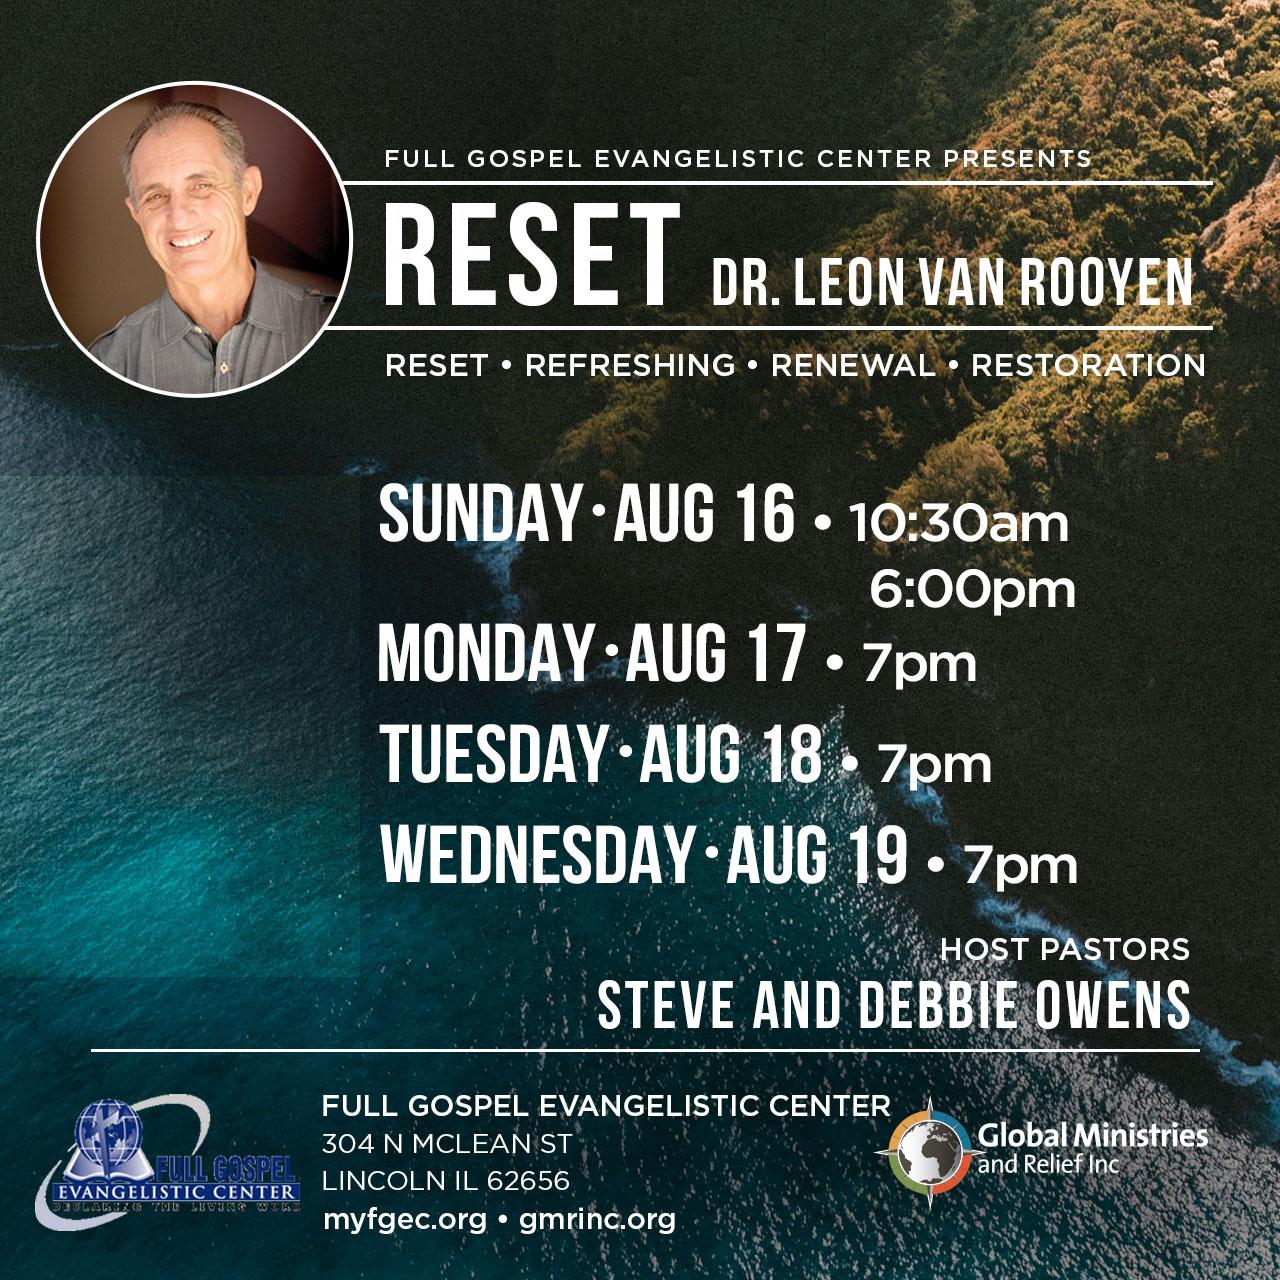 reset-full-gospel-dr-leon-van-rooyen